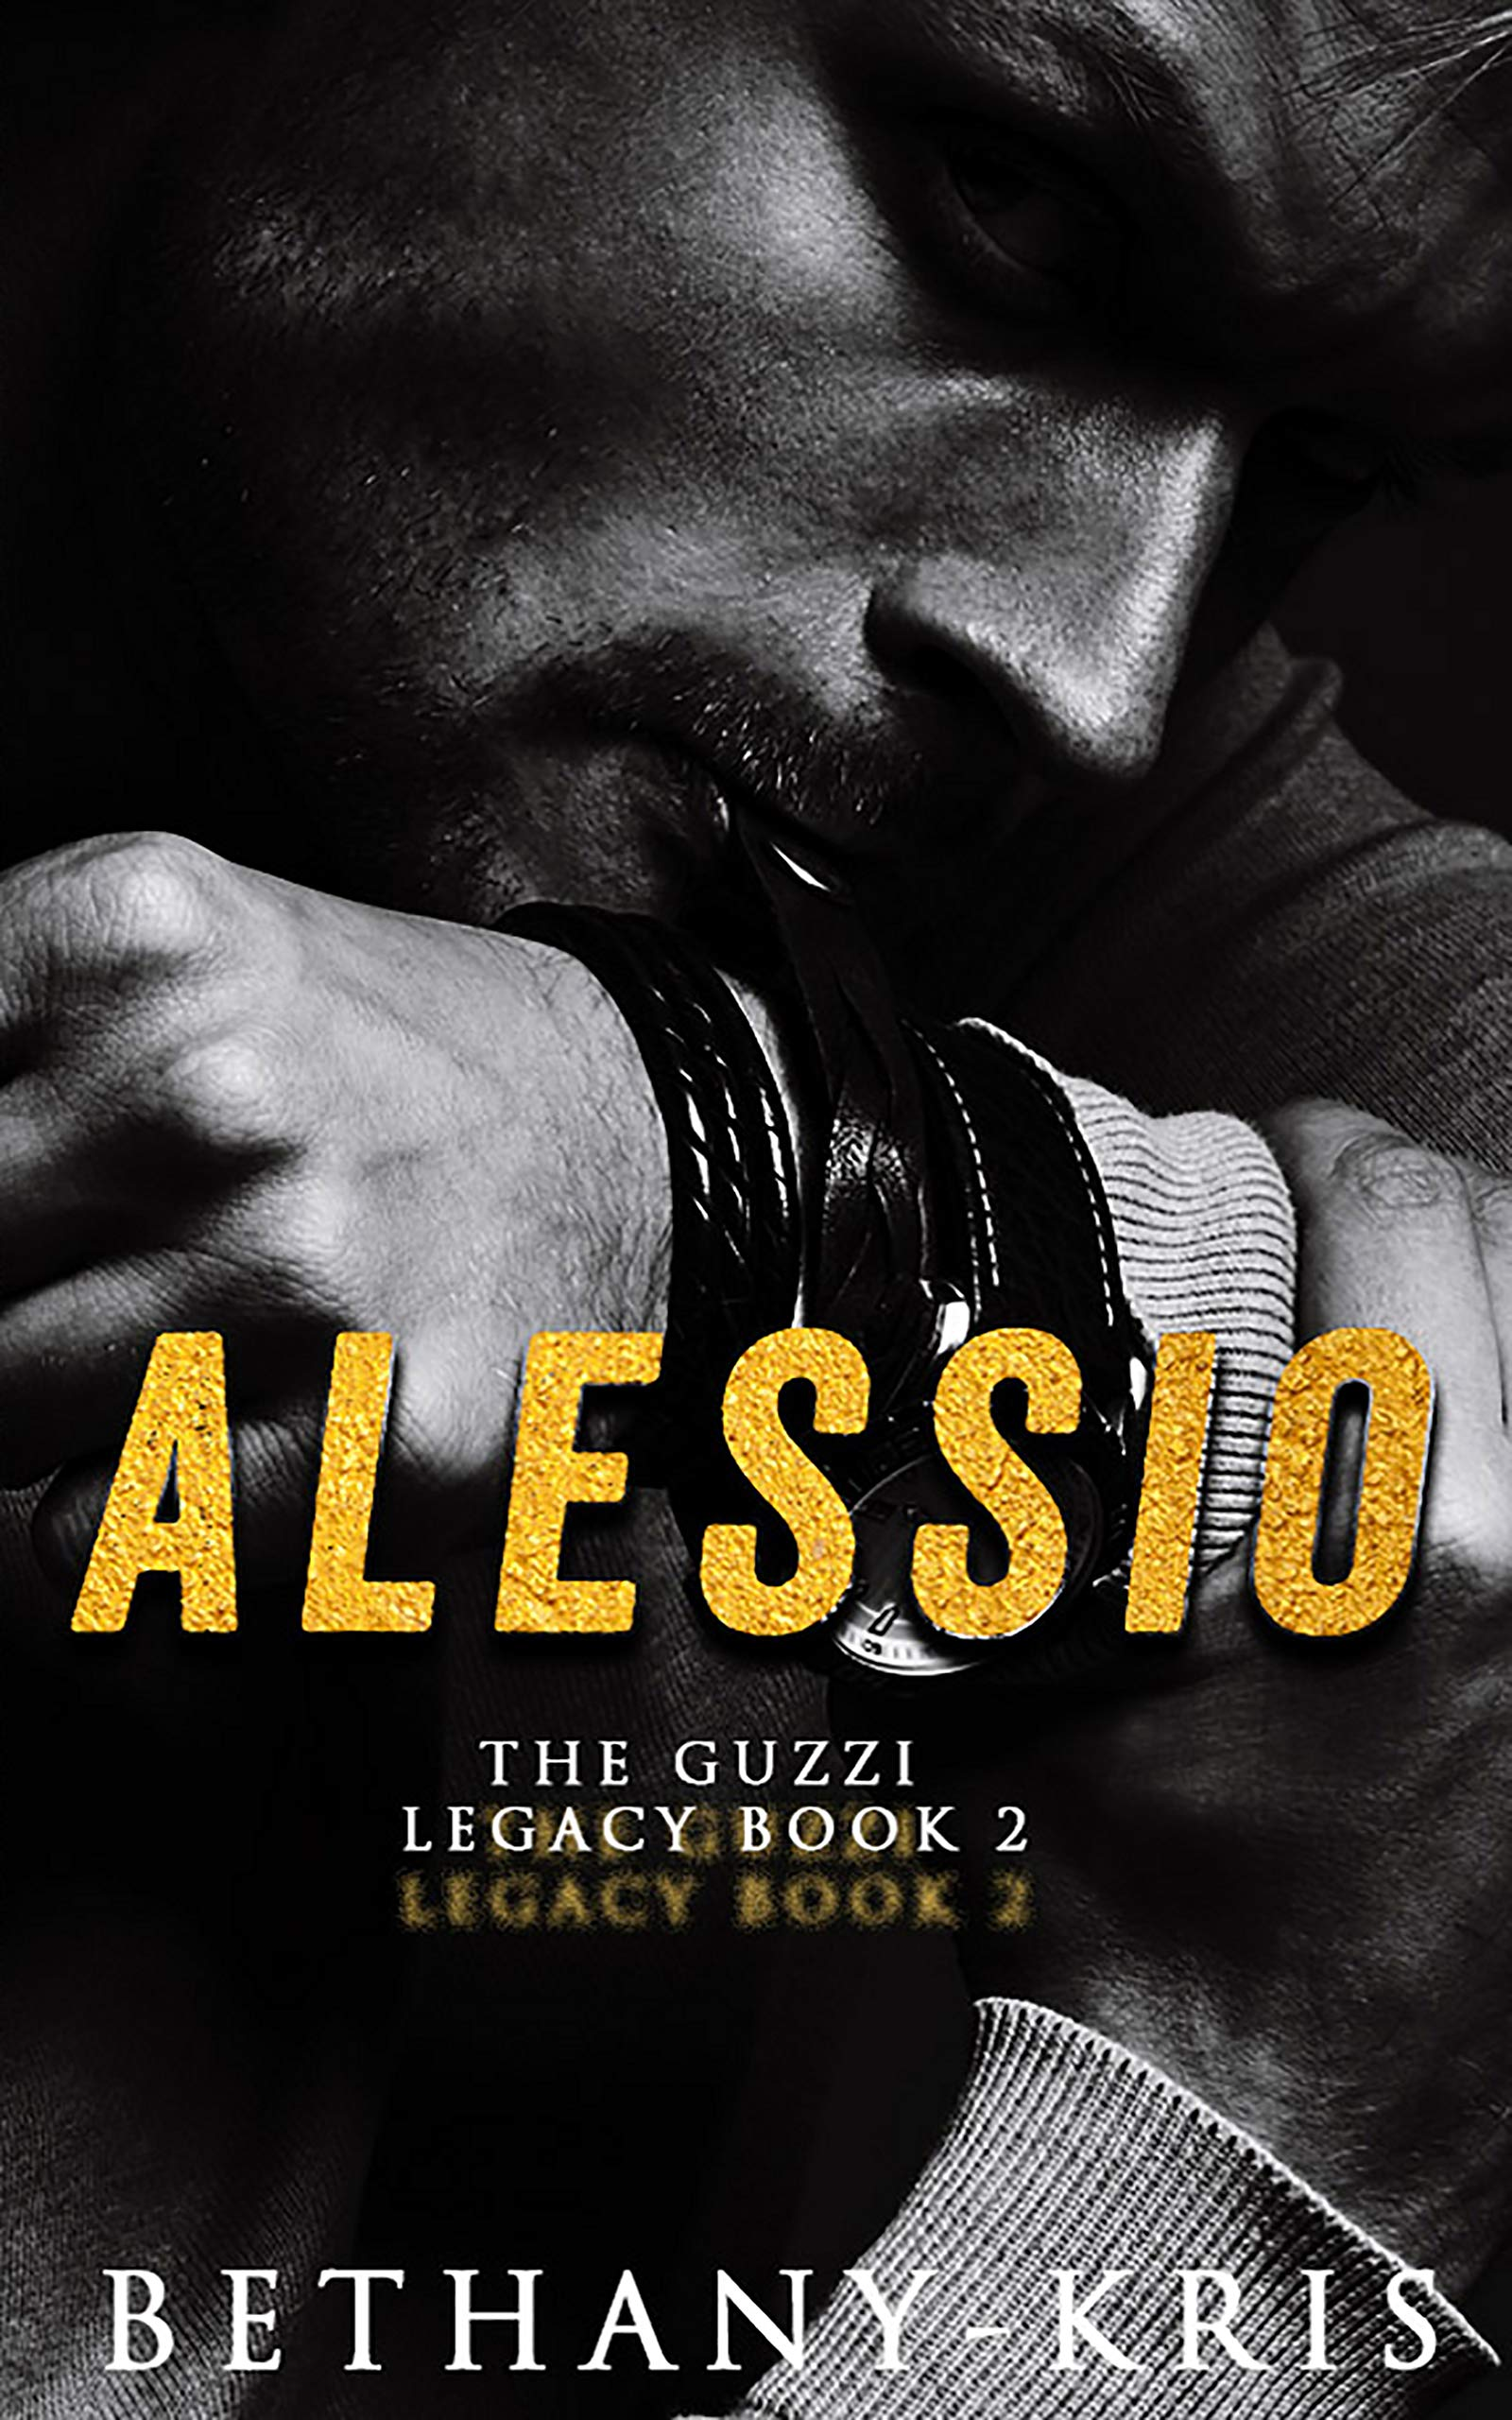 Bethany-Kris - The Guzzi Legacy 2 - Alessio